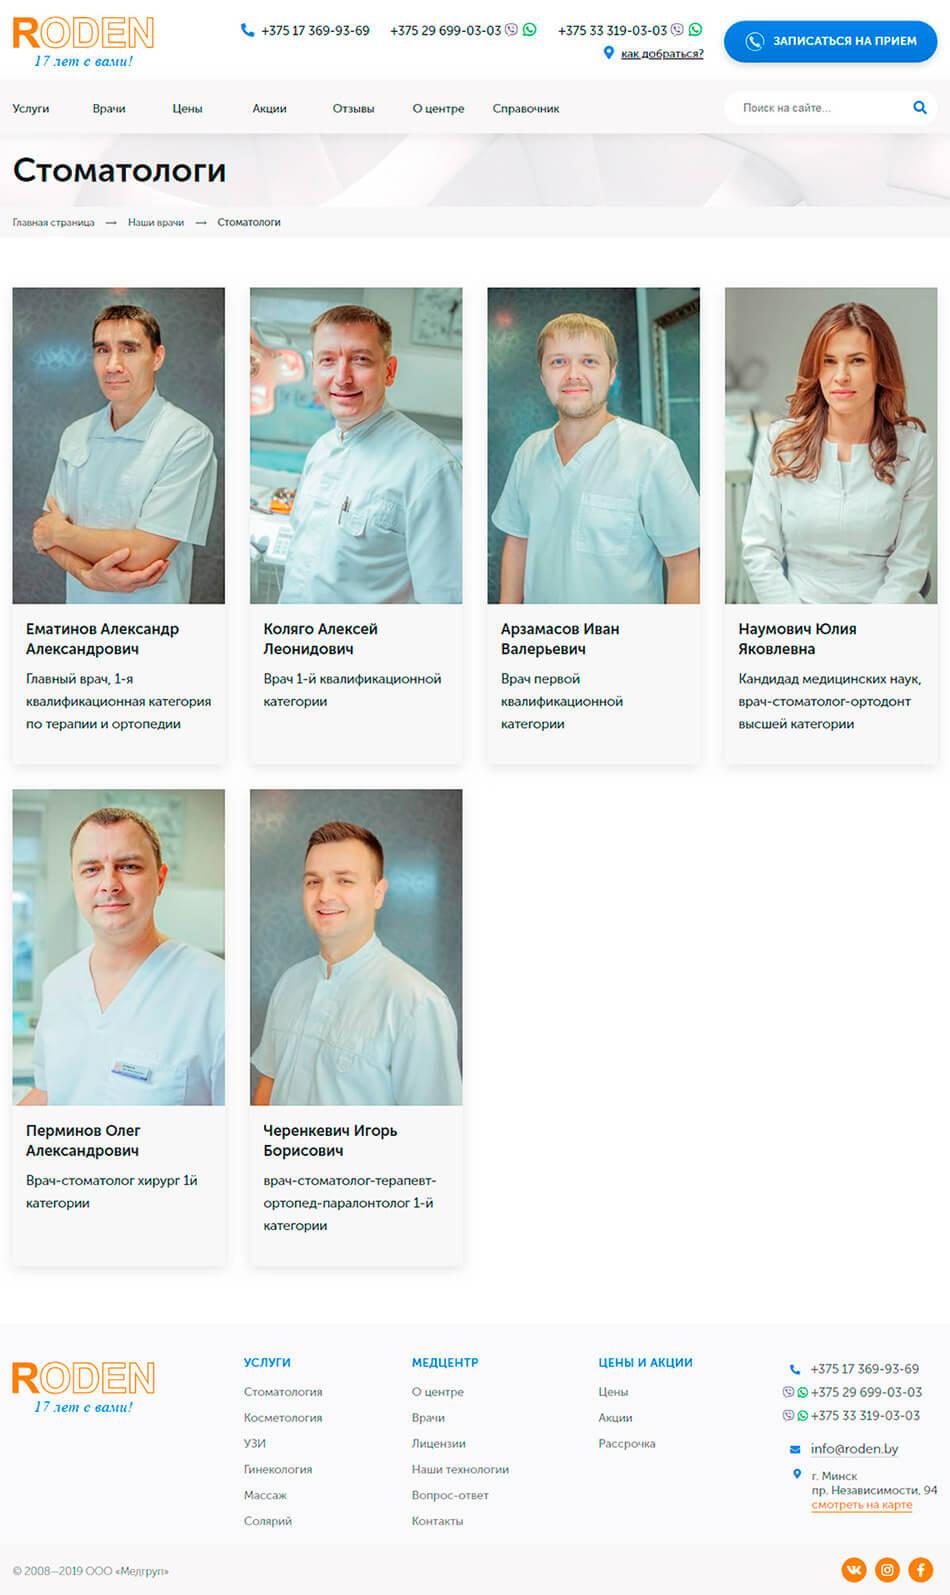 Стоматологи